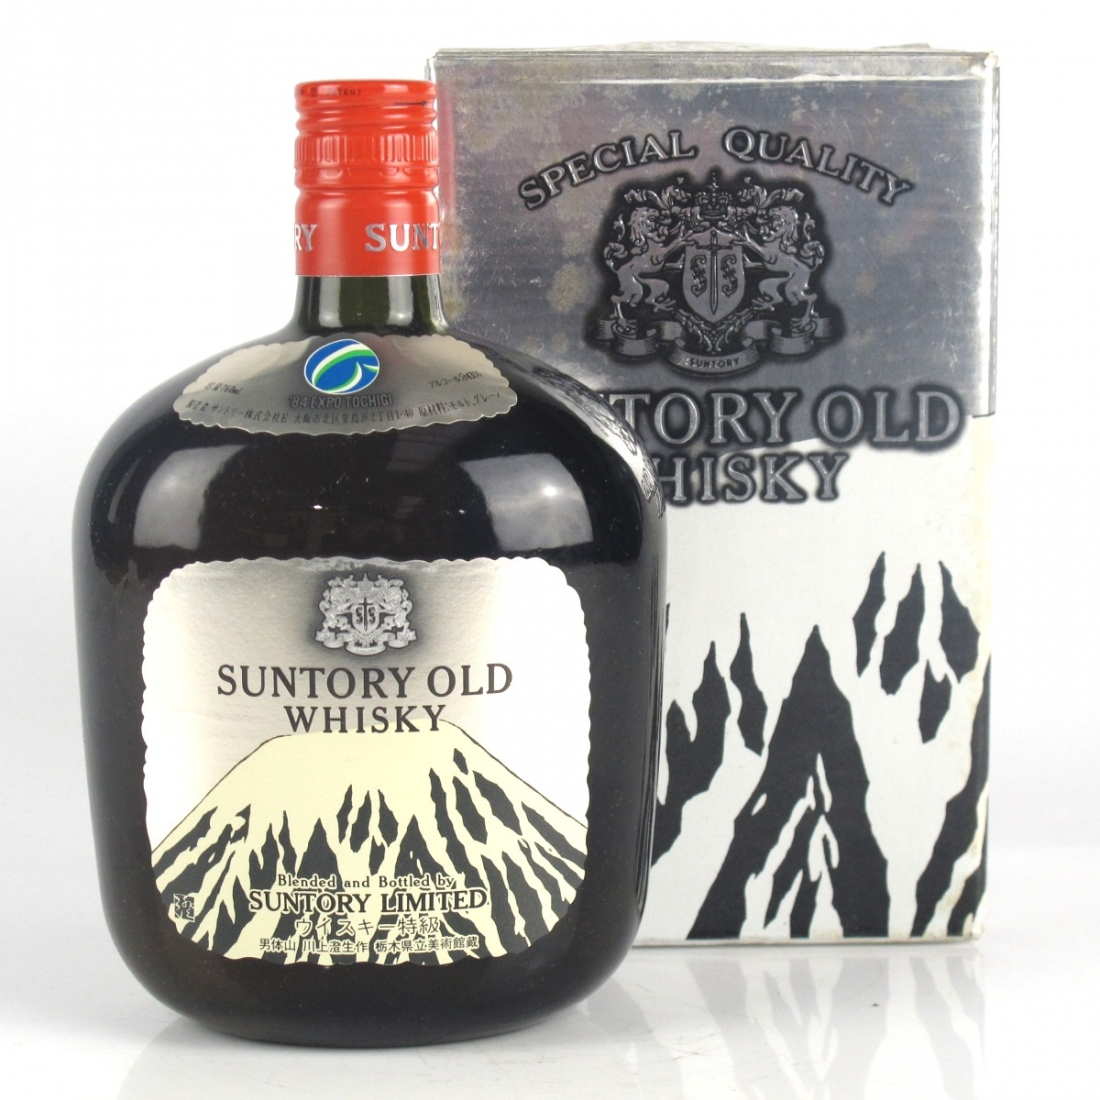 Suntory Old Whisky 76cl / Tochigi Expo '84